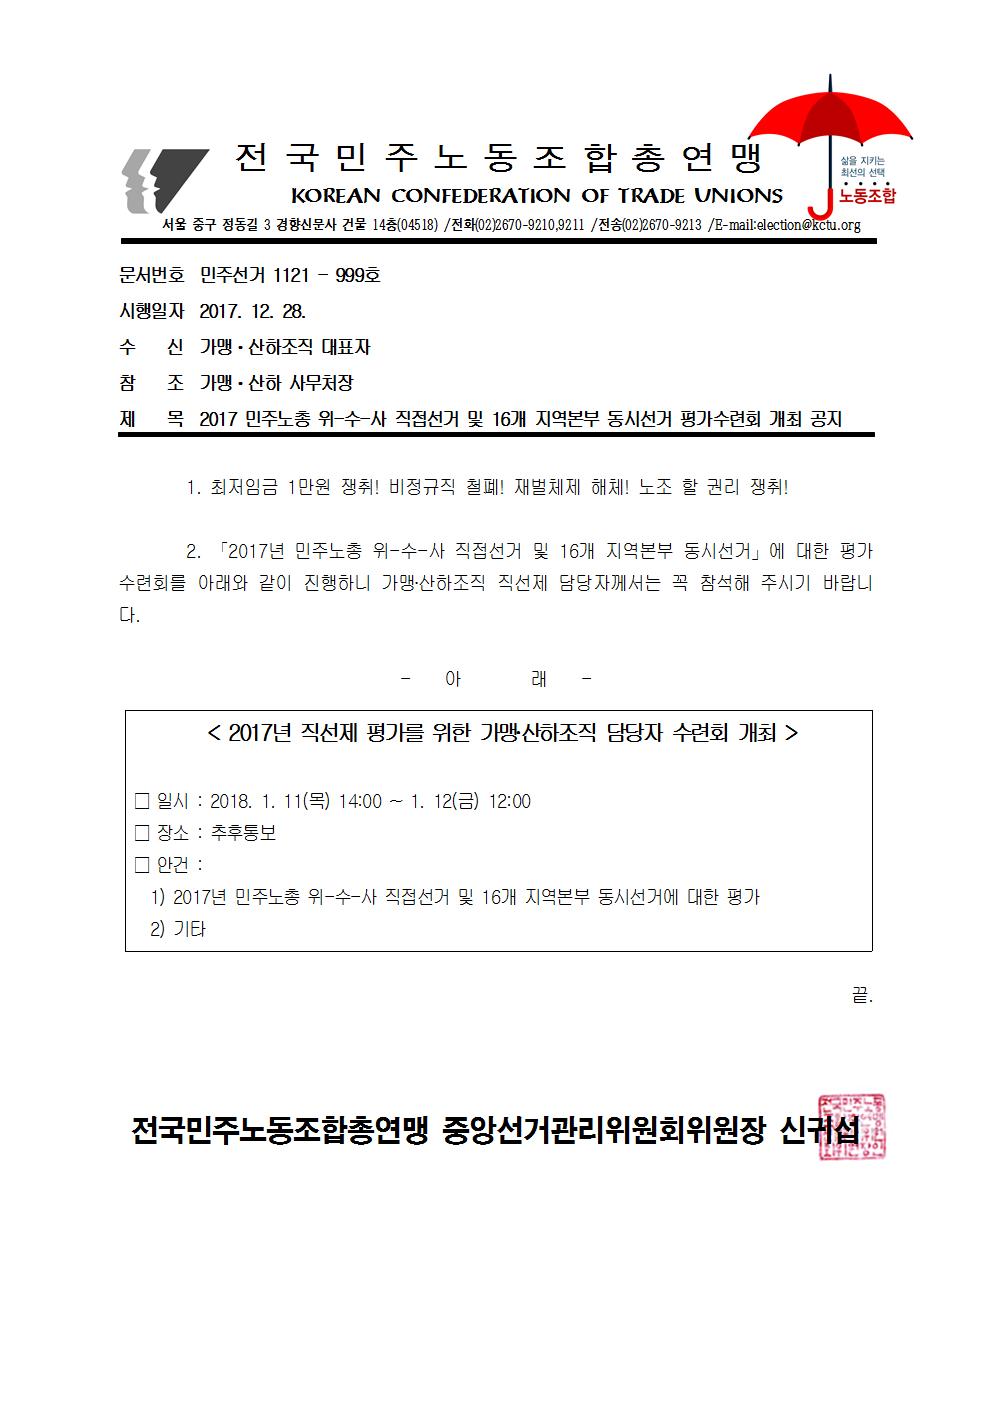 17kctu999_2017 민주노총 위-수-사 직접선거 및 16개 지역본부 동시선거 평가수련회 개최 공지001.png